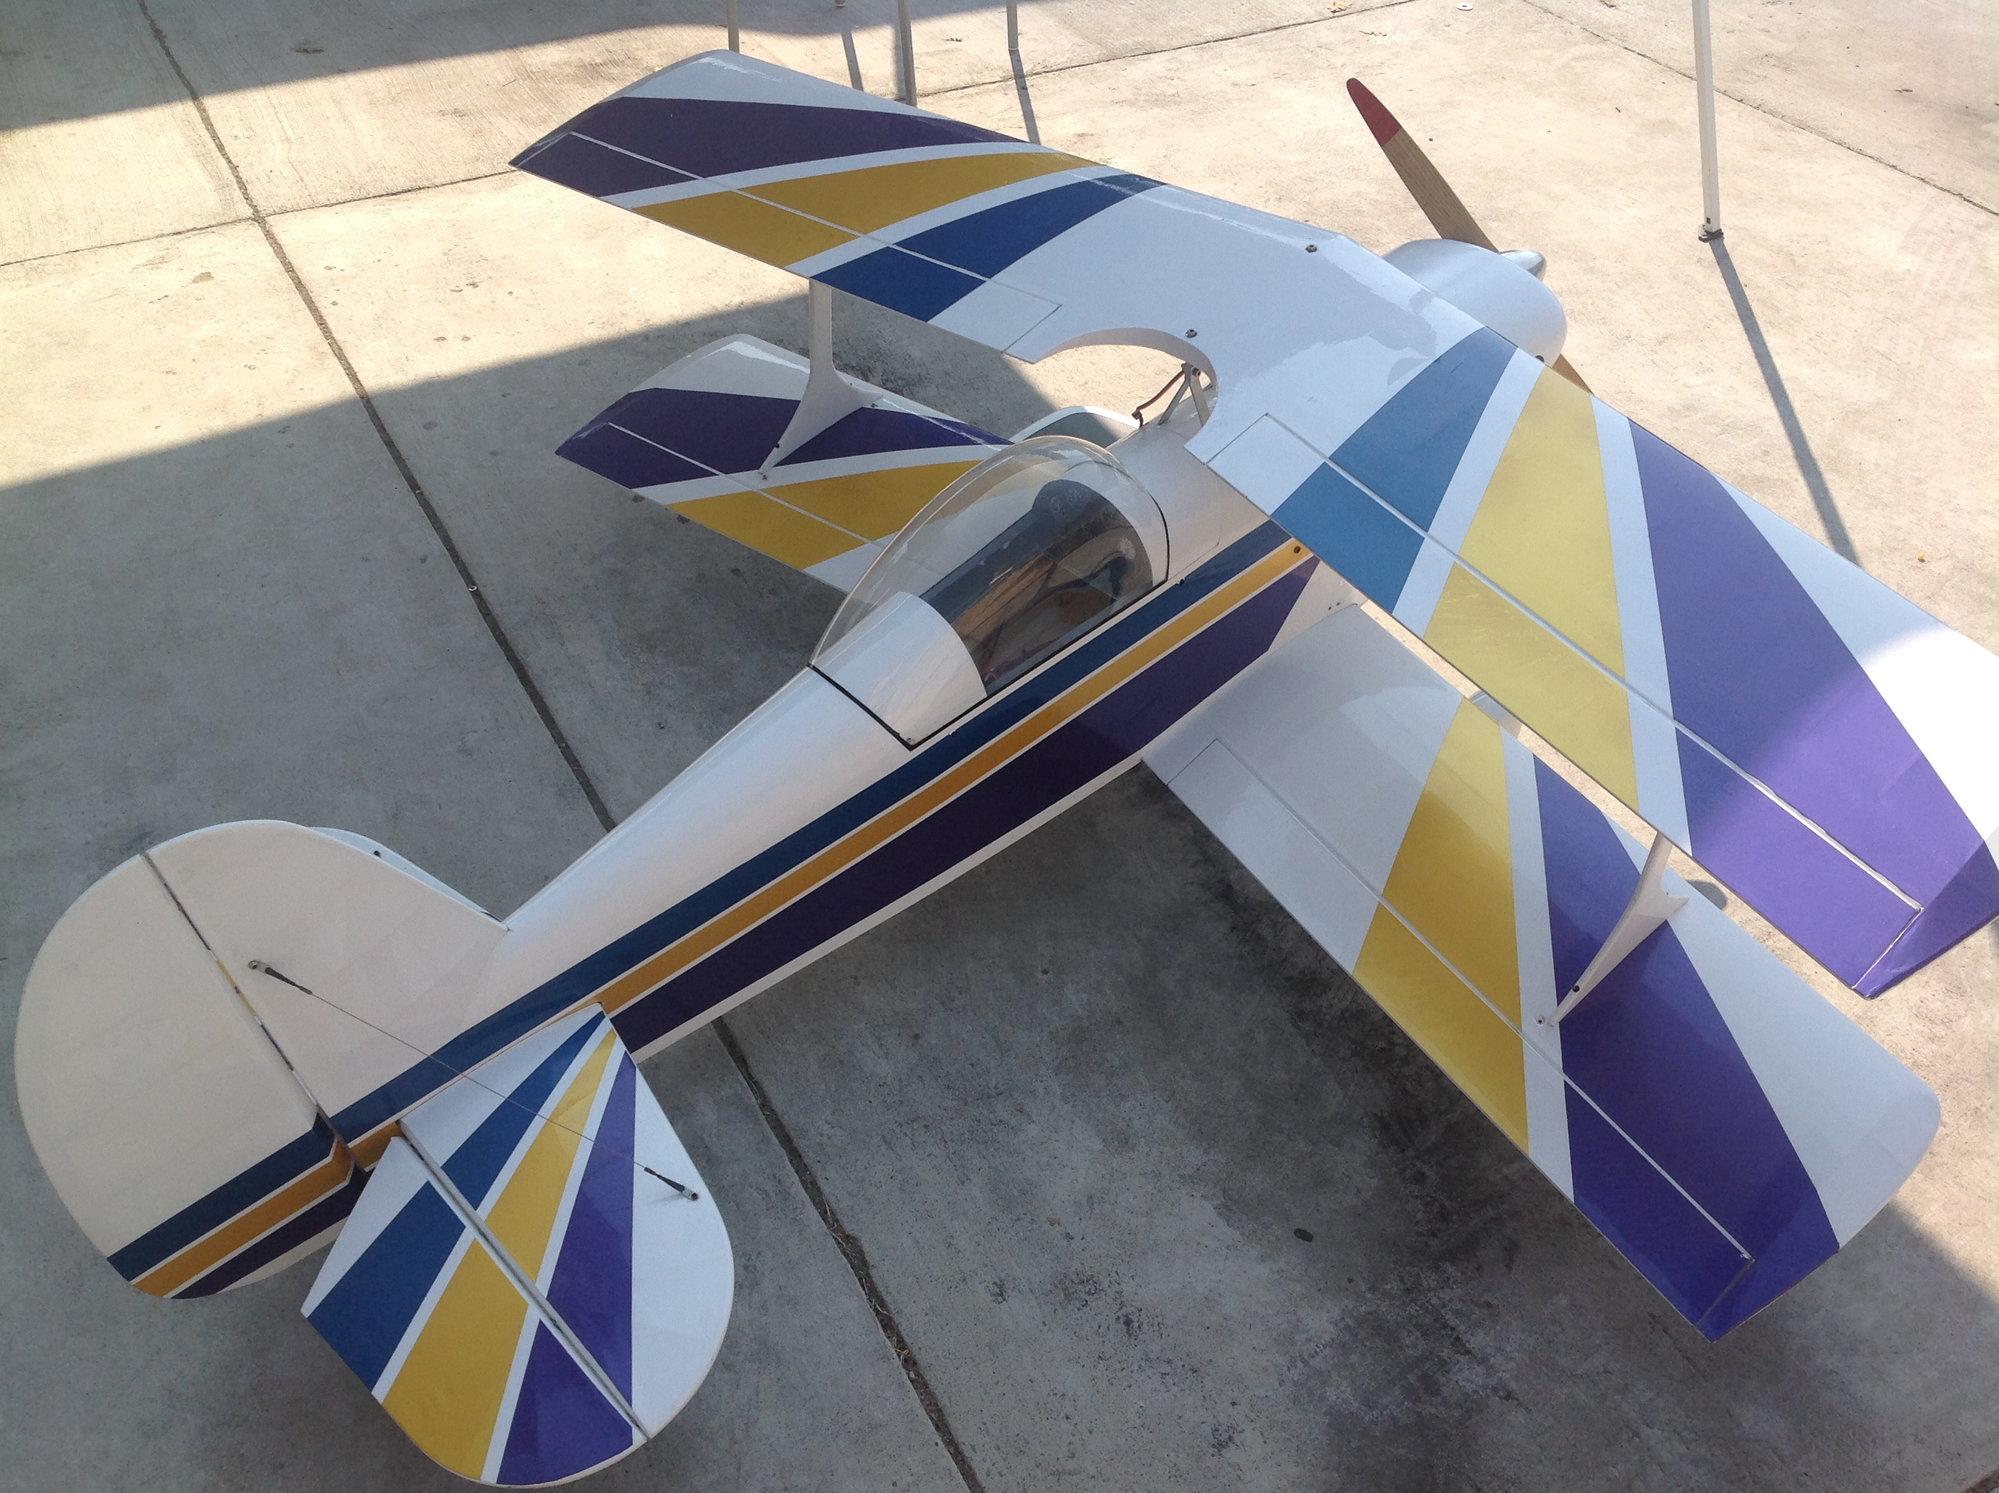 biplane plans - RCU Forums